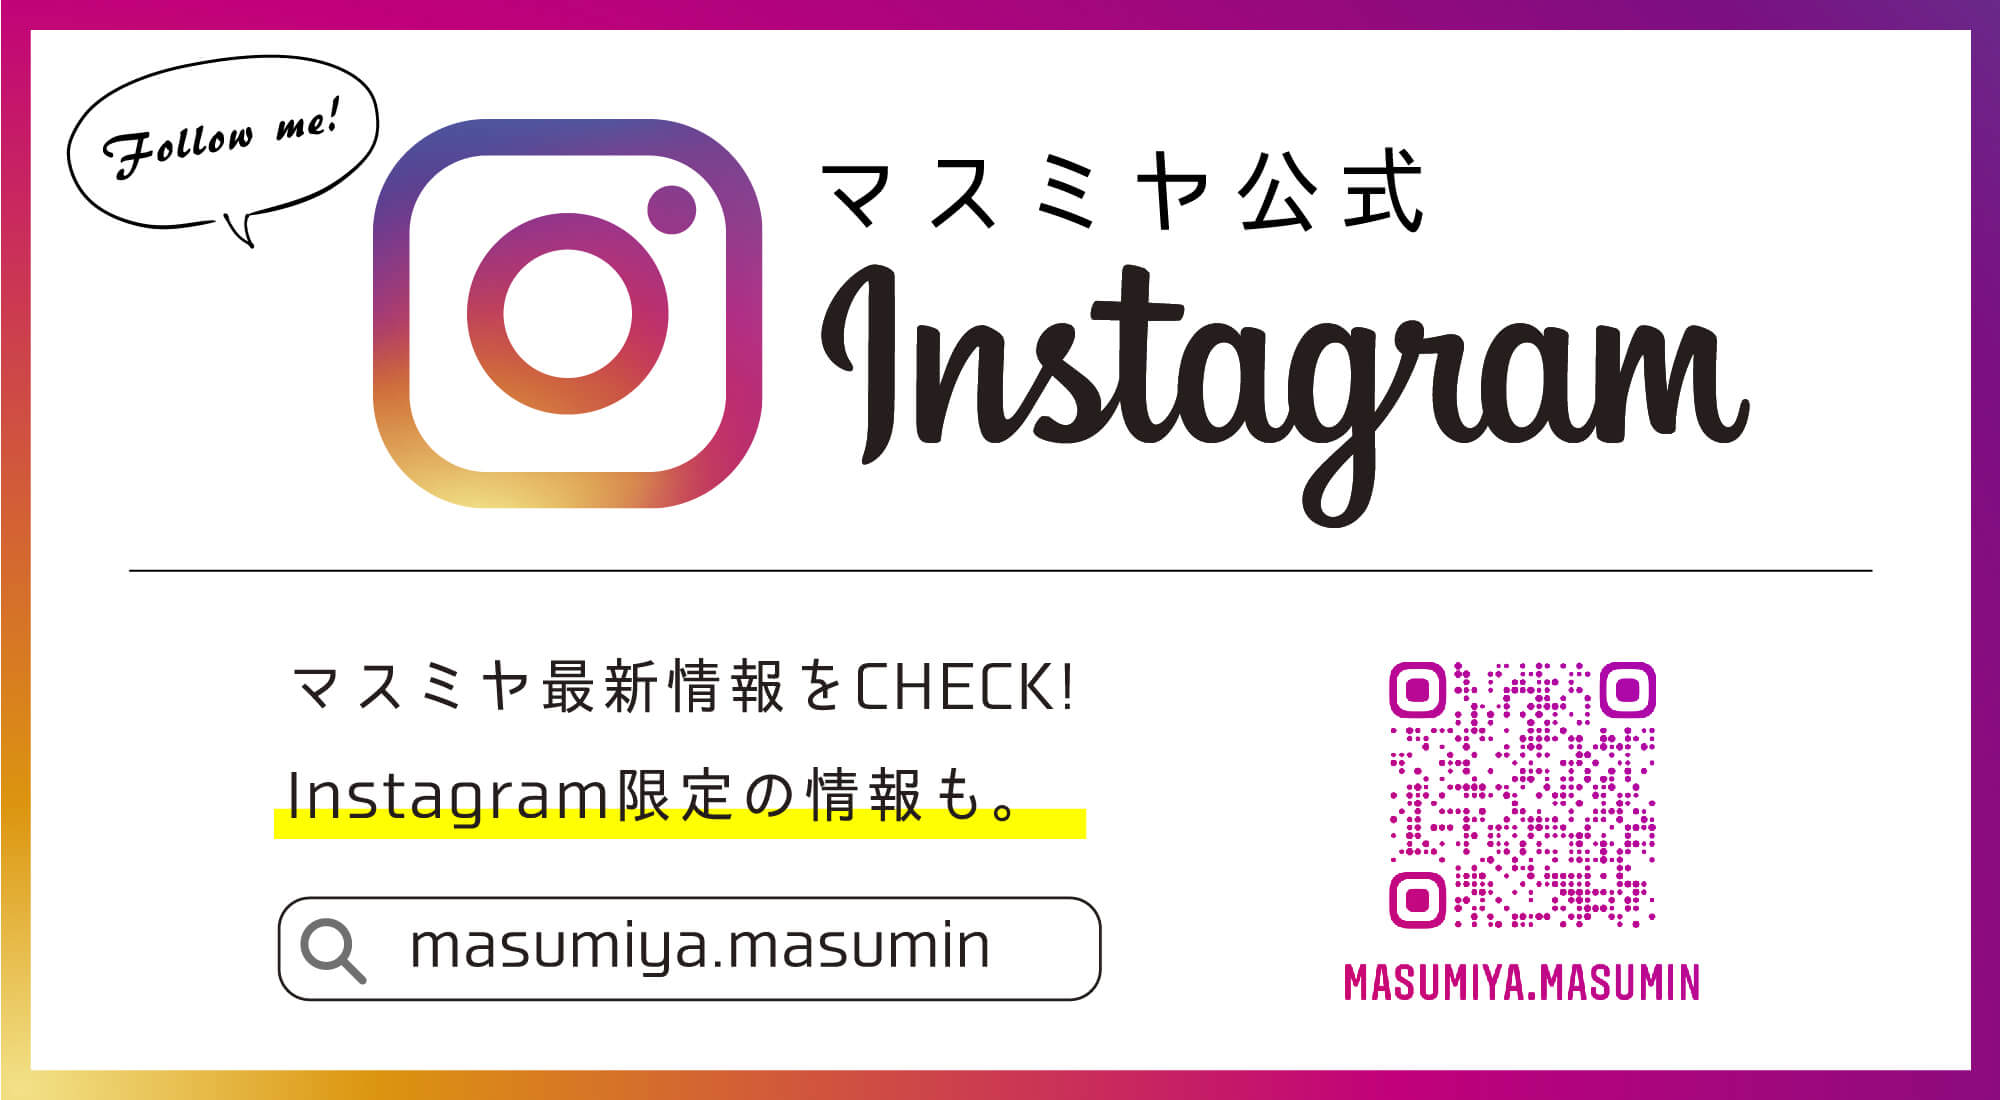 Instagram登録